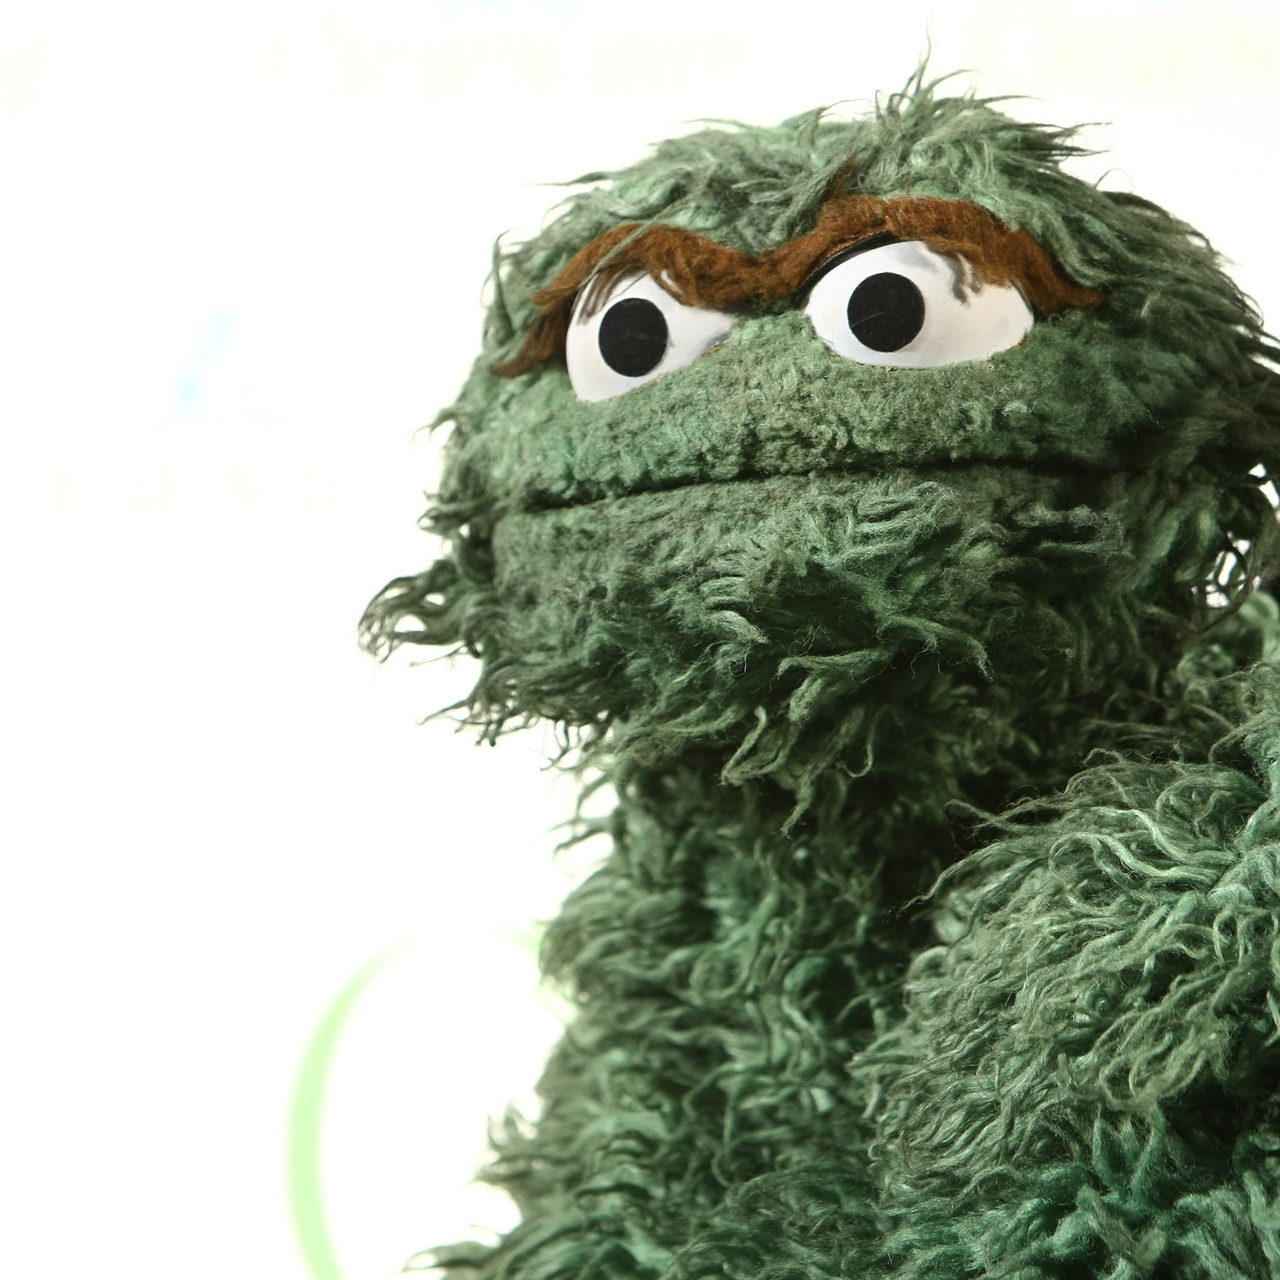 Oscar The Grouch Grouch Oscar The Grouch Muppets